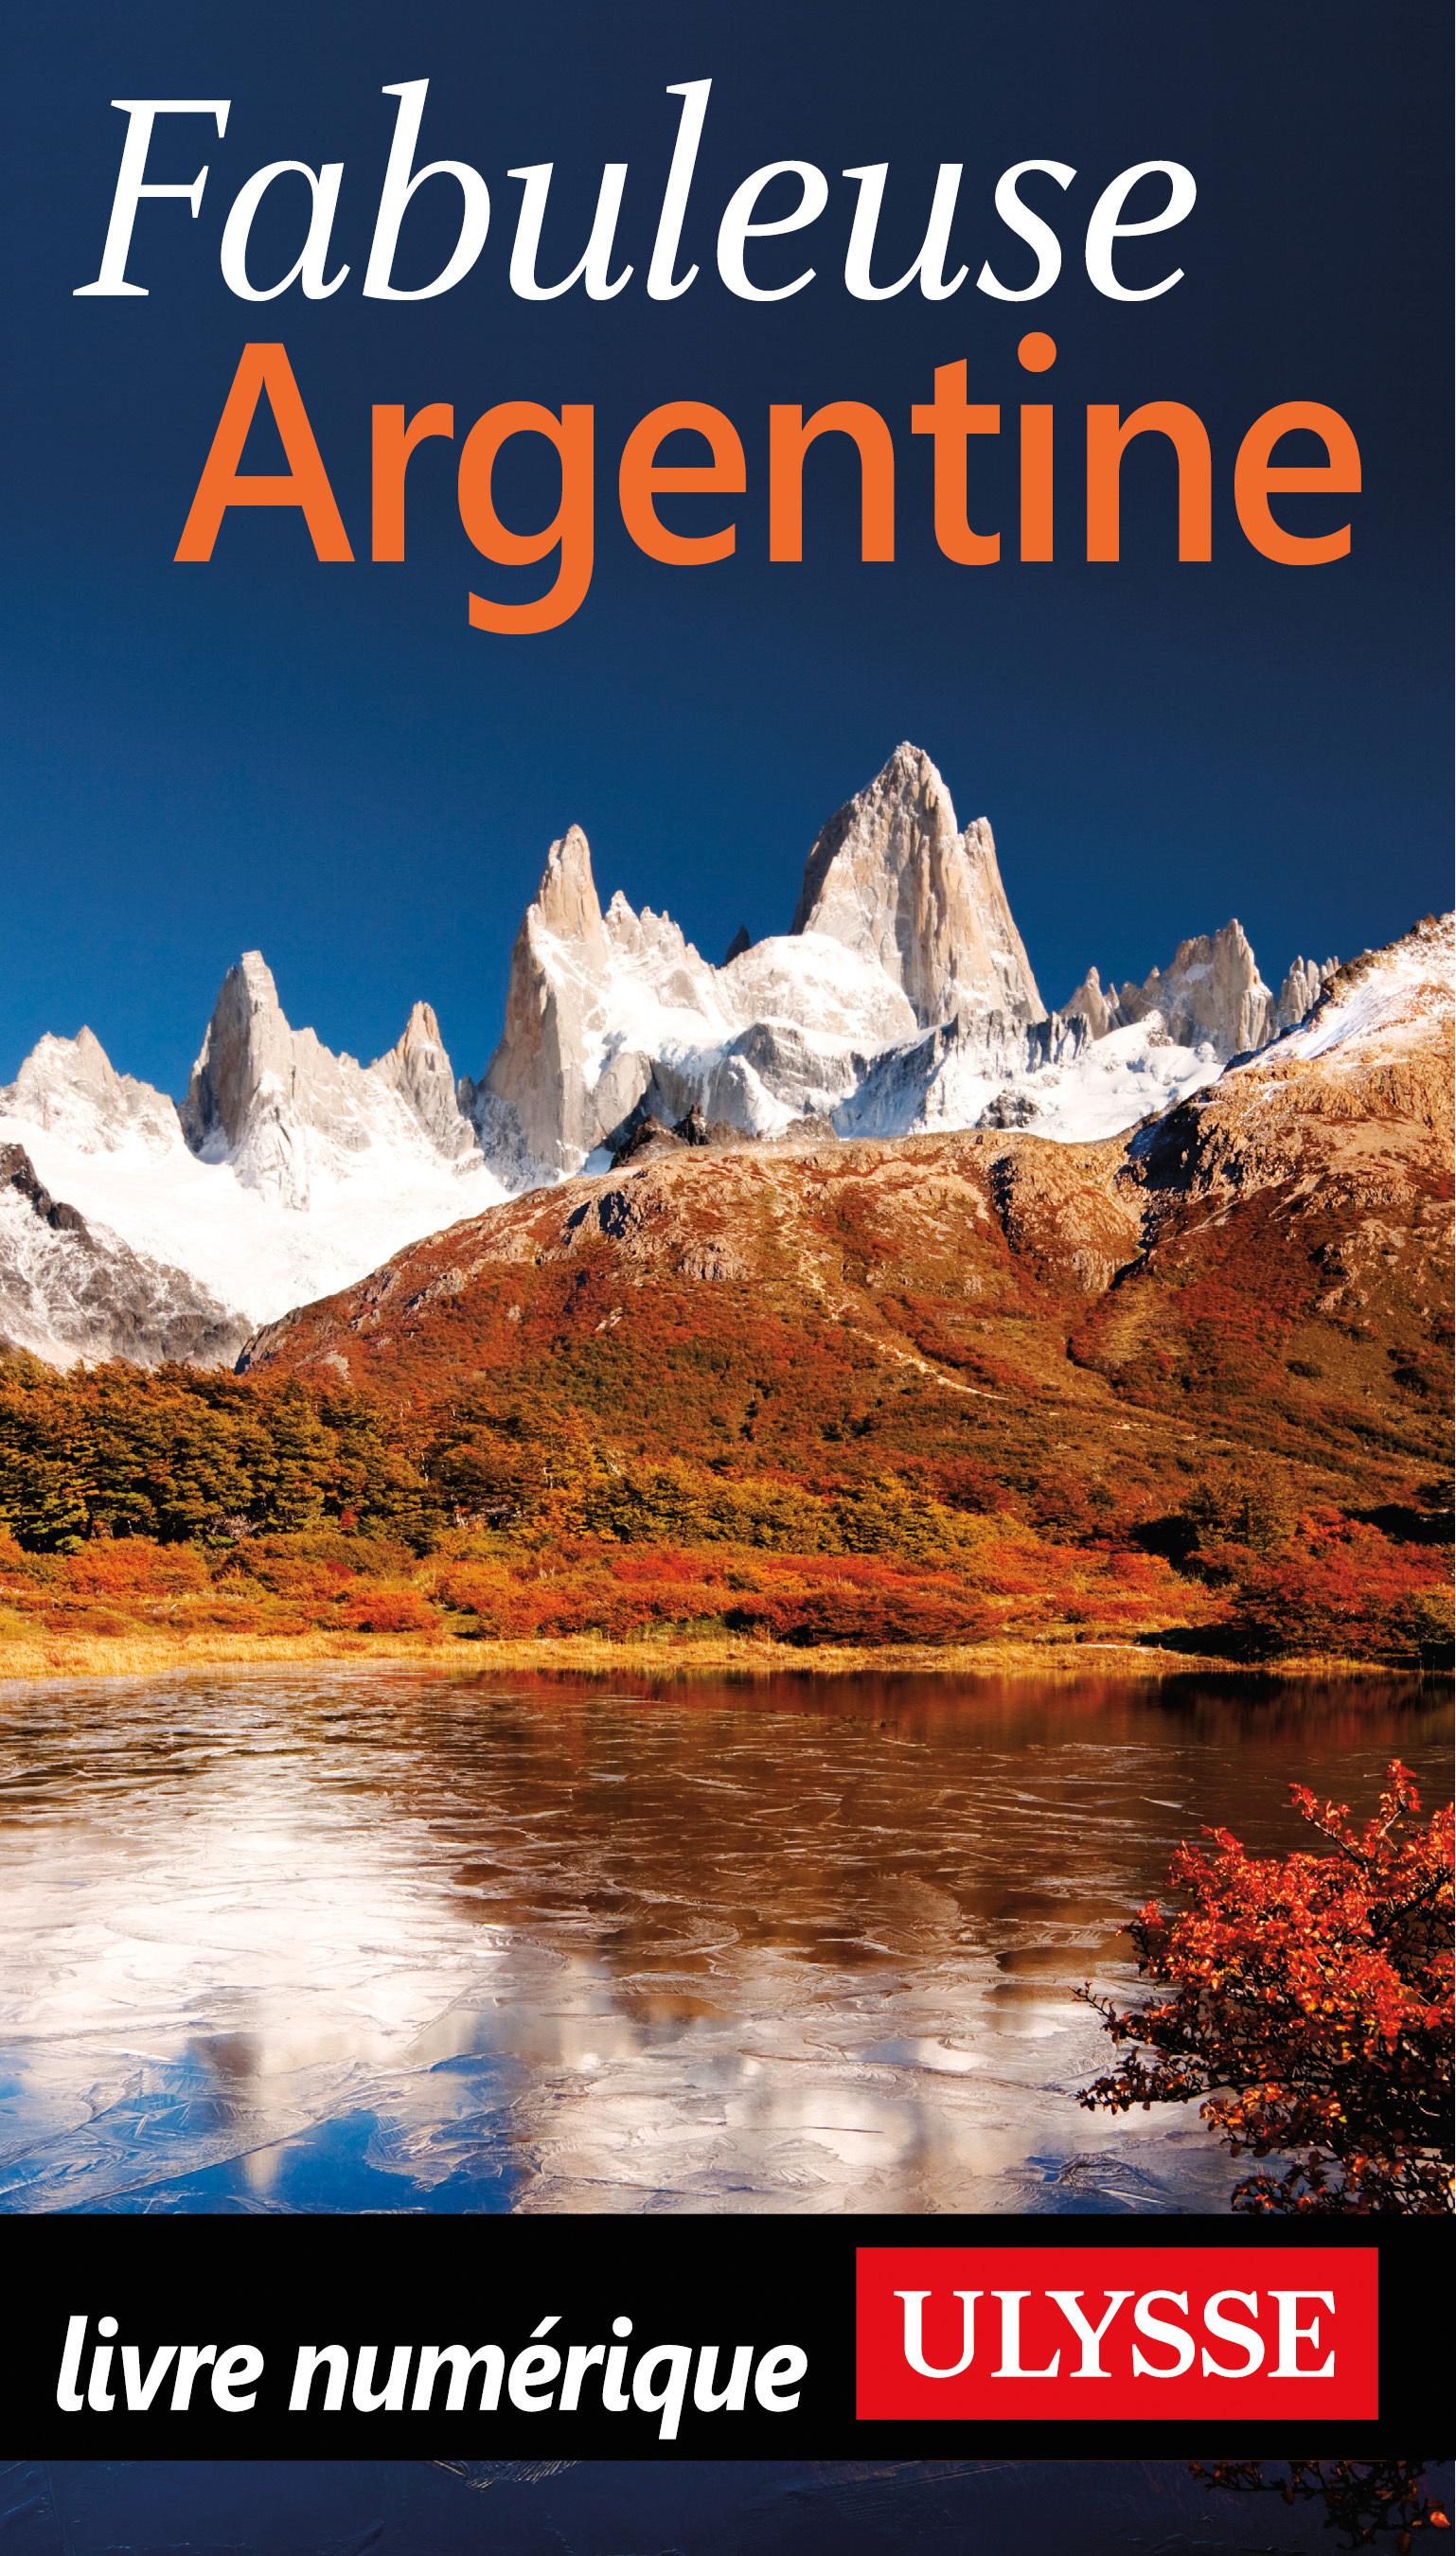 Fabuleuse Argentine